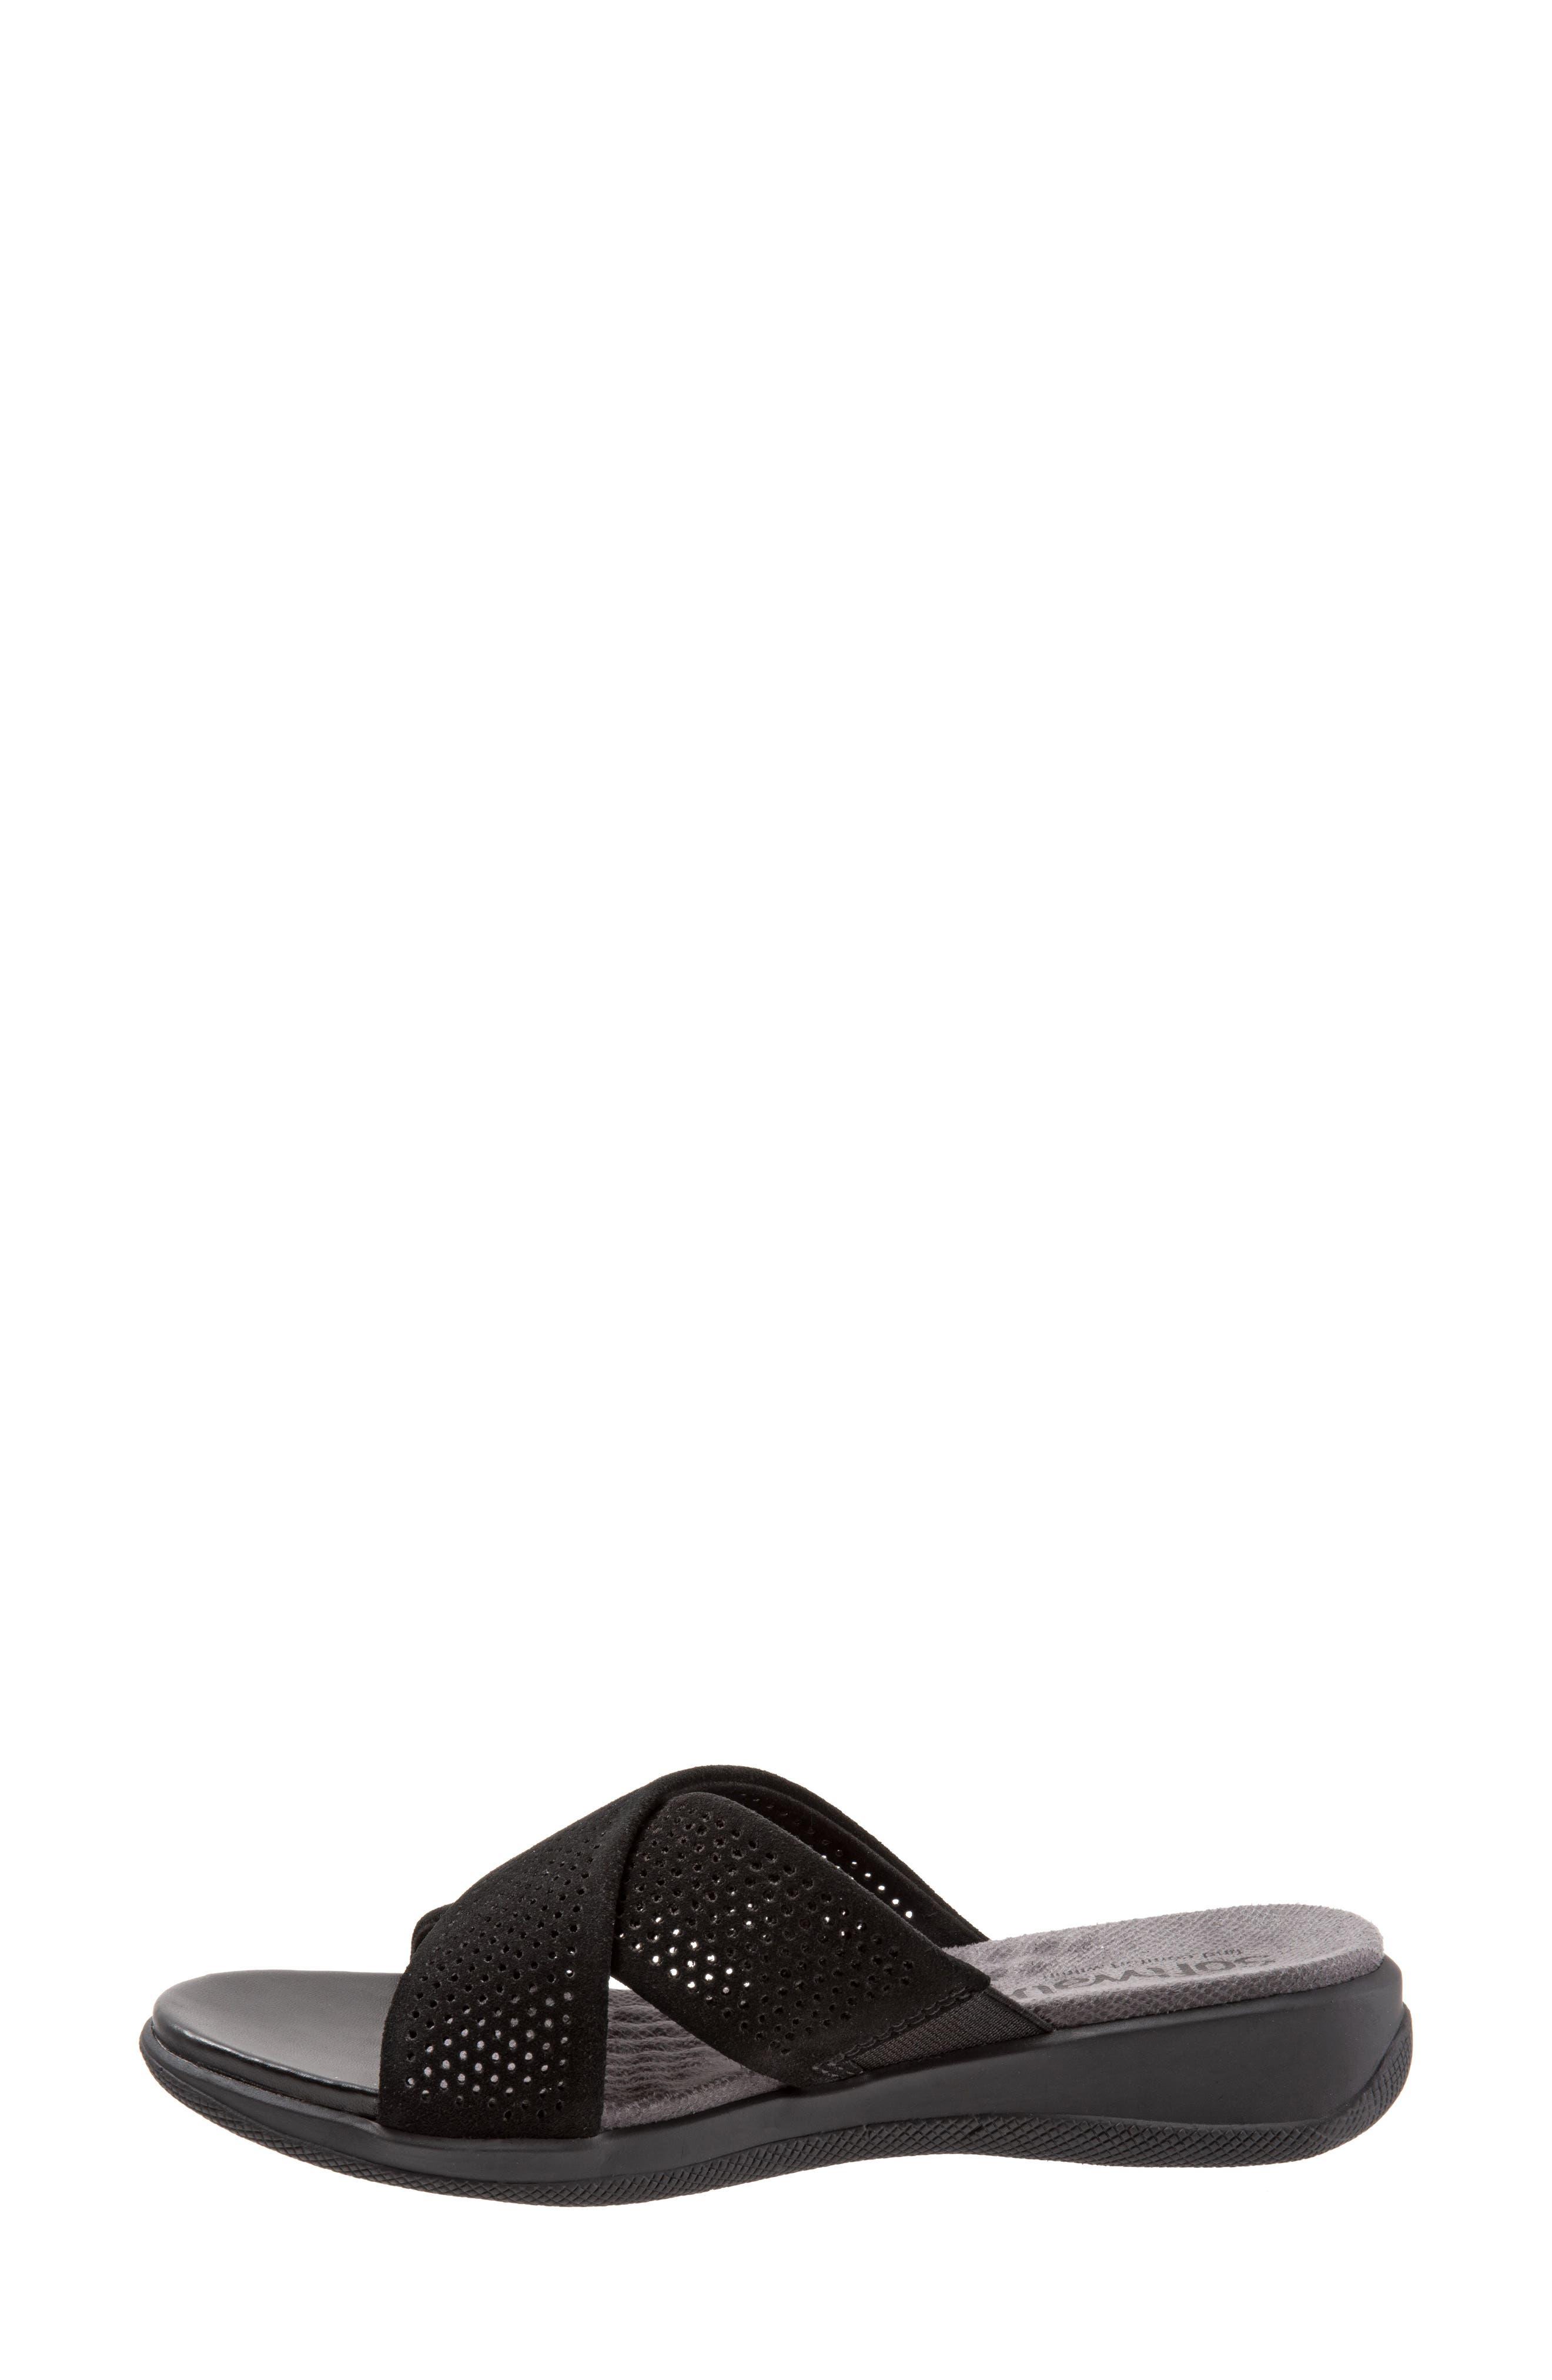 SOFTWALK<SUP>®</SUP>, 'Tillman' Leather Cross Strap Slide Sandal, Alternate thumbnail 8, color, 002